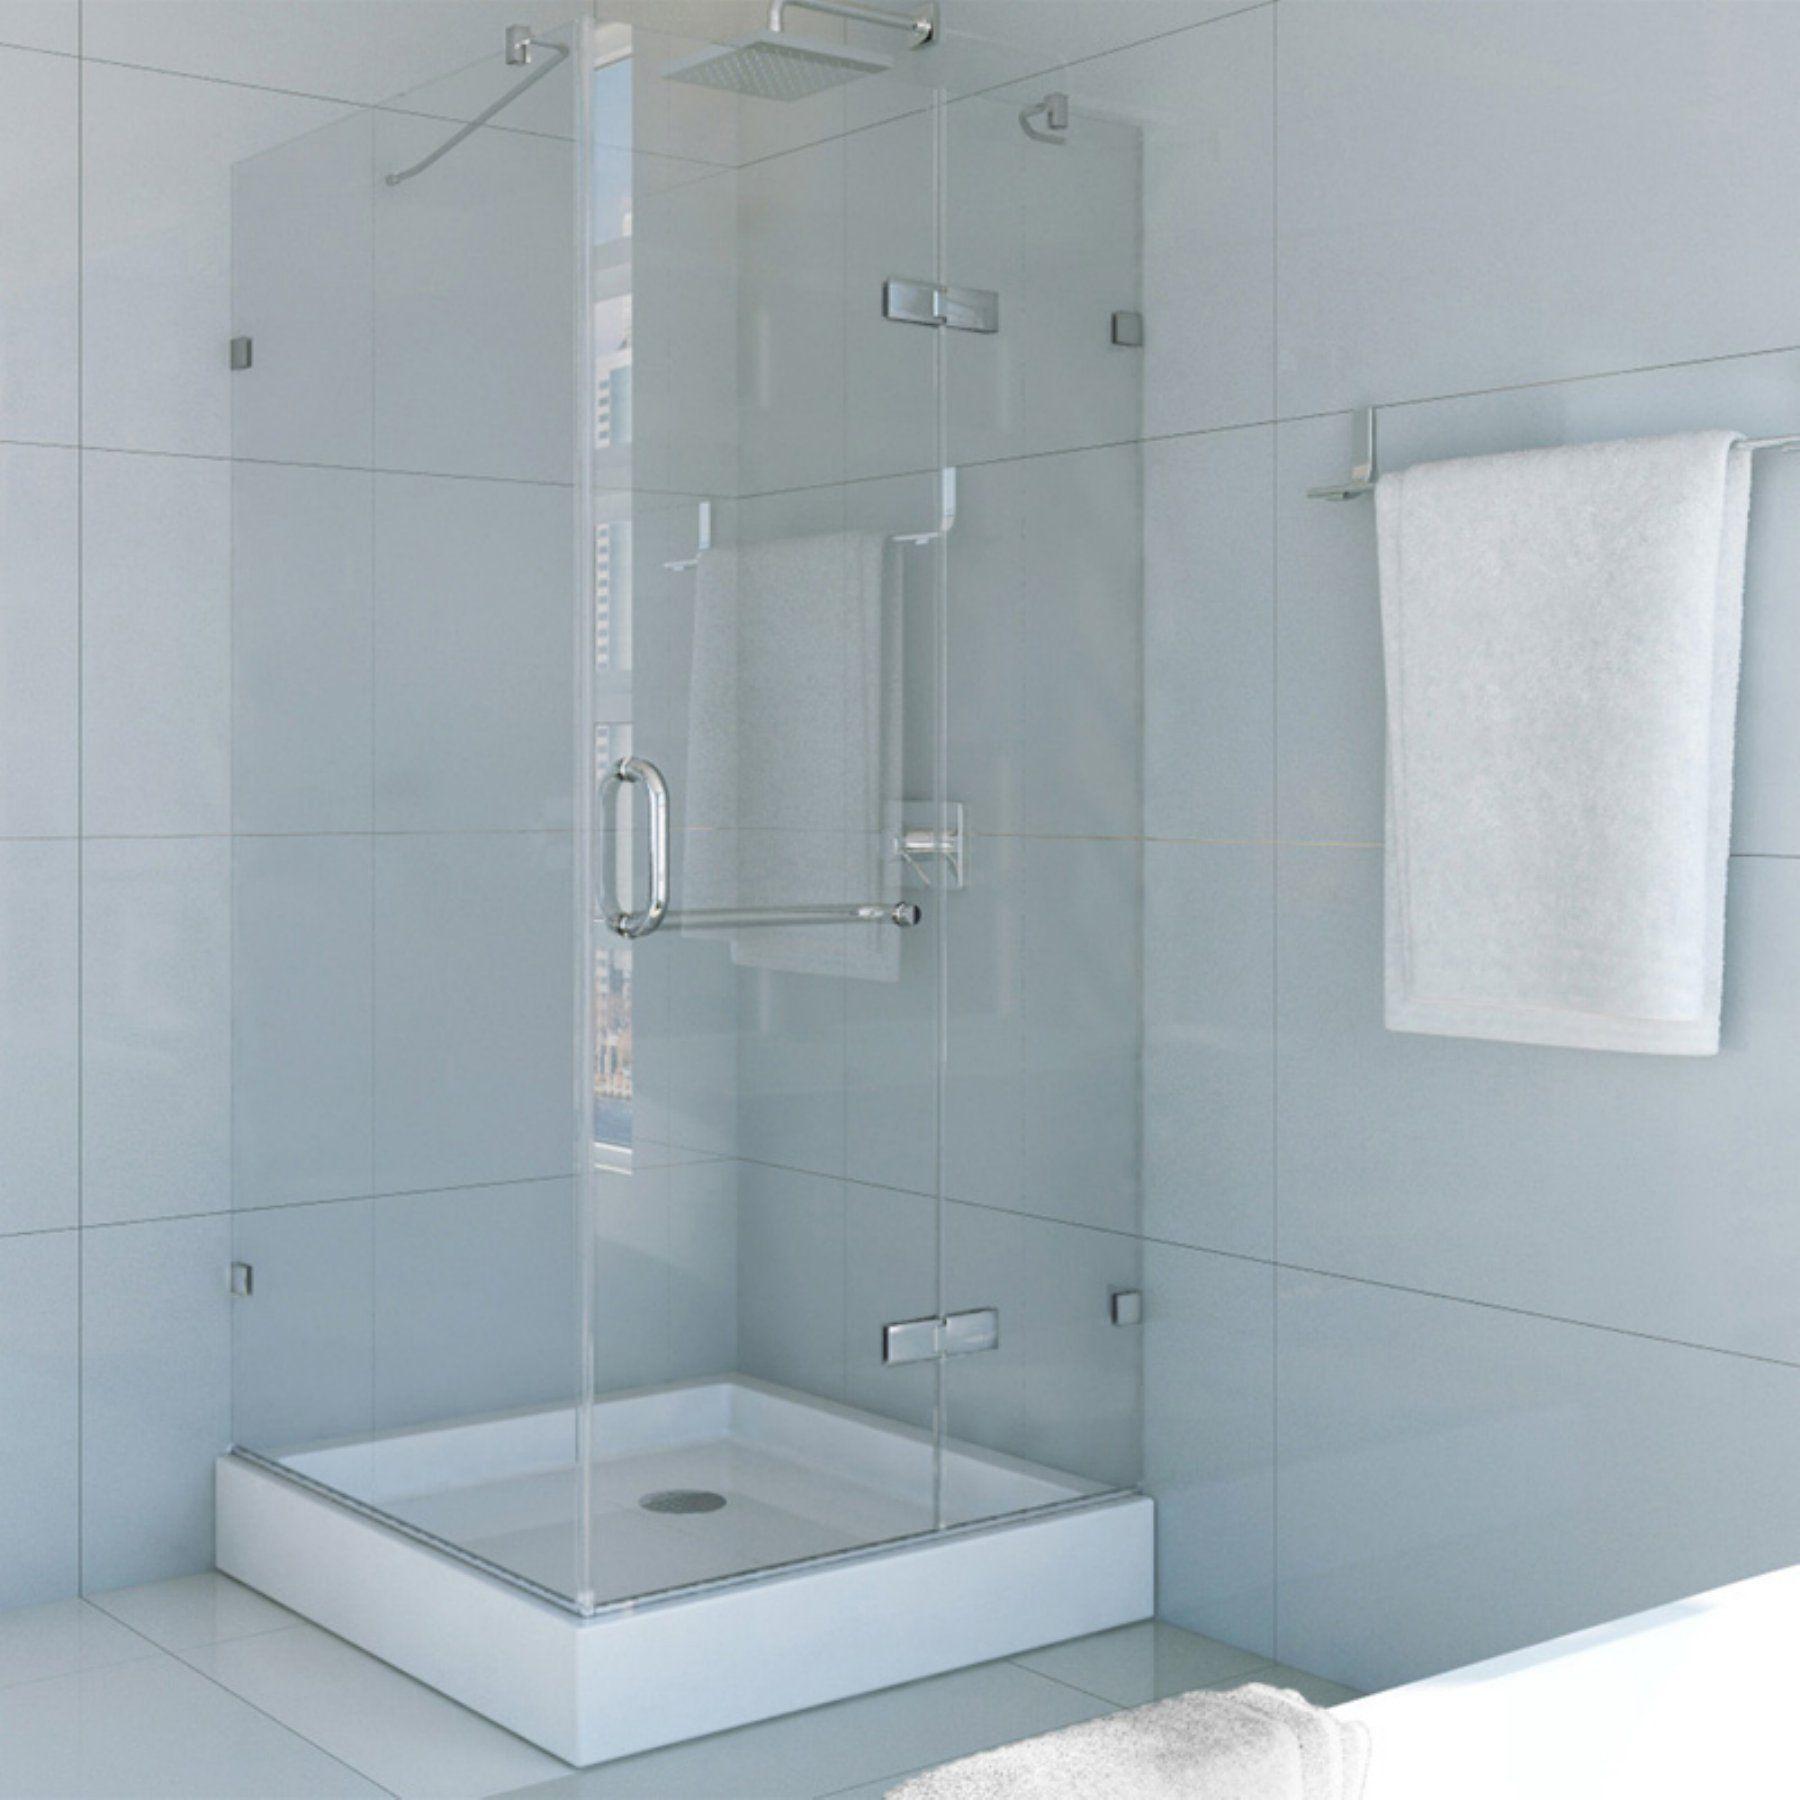 Vigo VG6011363W 36.125W x 79.21H in. Clear Glass Shower Enclosure ...